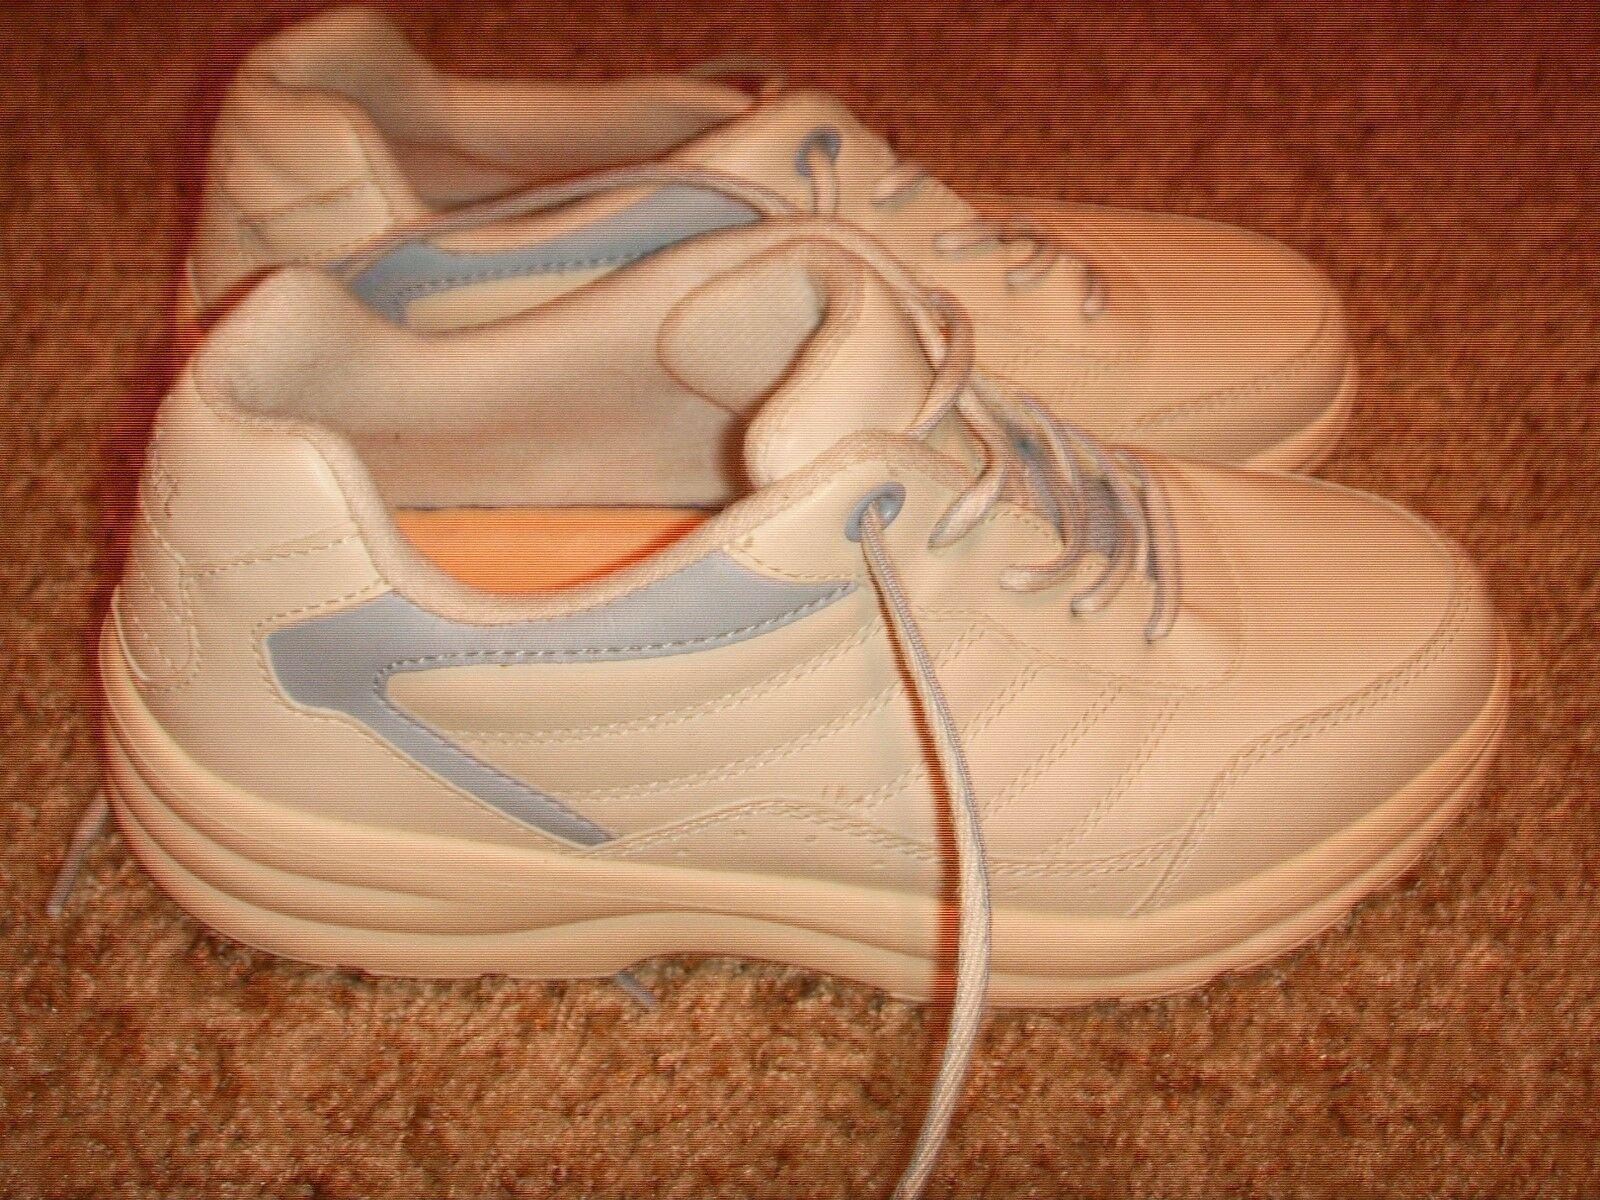 Dr Comfort Walk 3540 Therapeutic Diabetic Comfort shoes Womens Size 7M